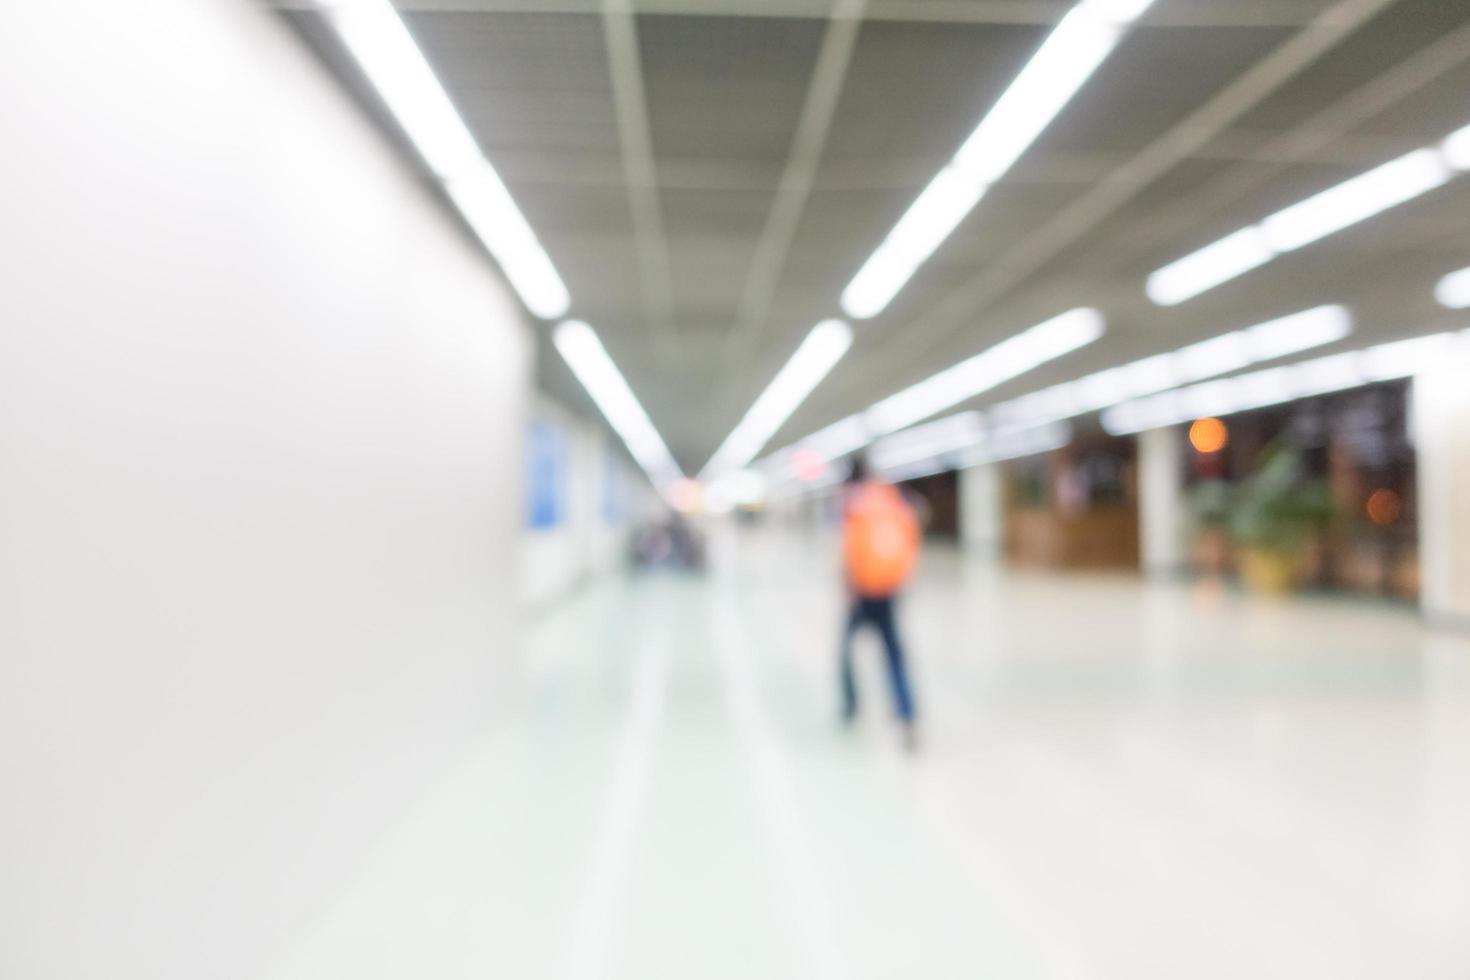 Fondo abstracto aeropuerto borrosa foto